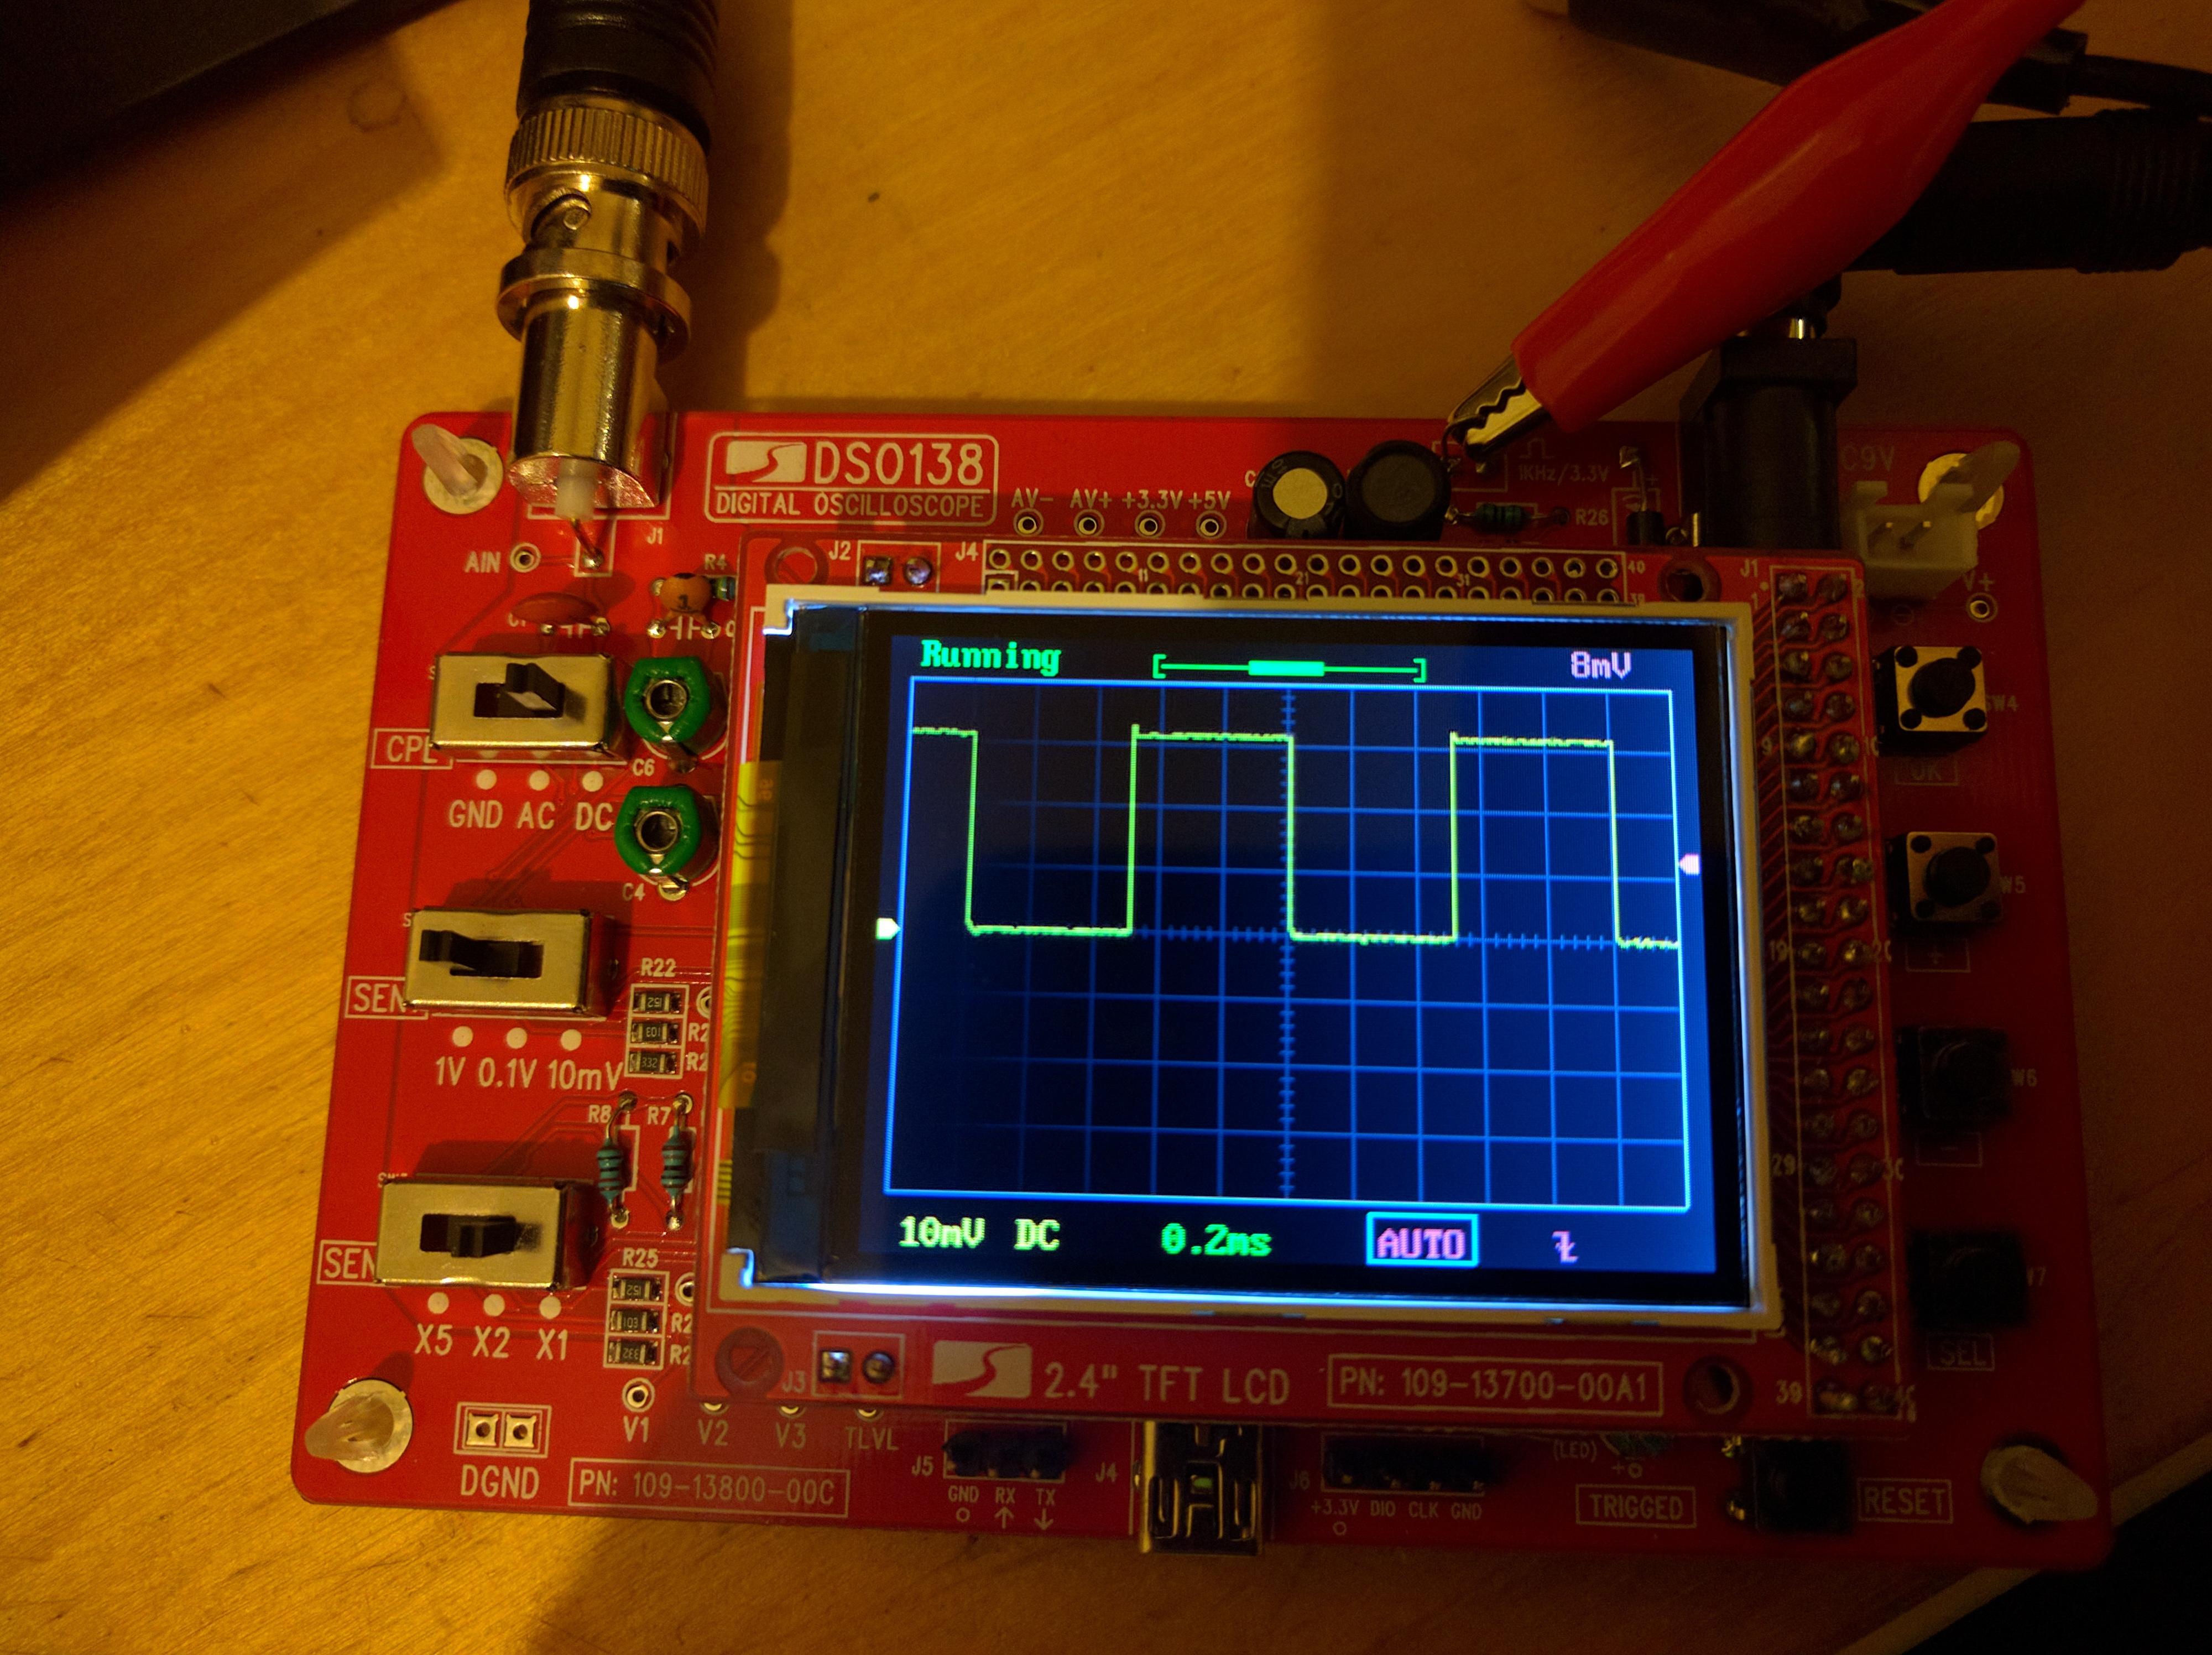 Building A Oscilloscope : Building an oscilloscope